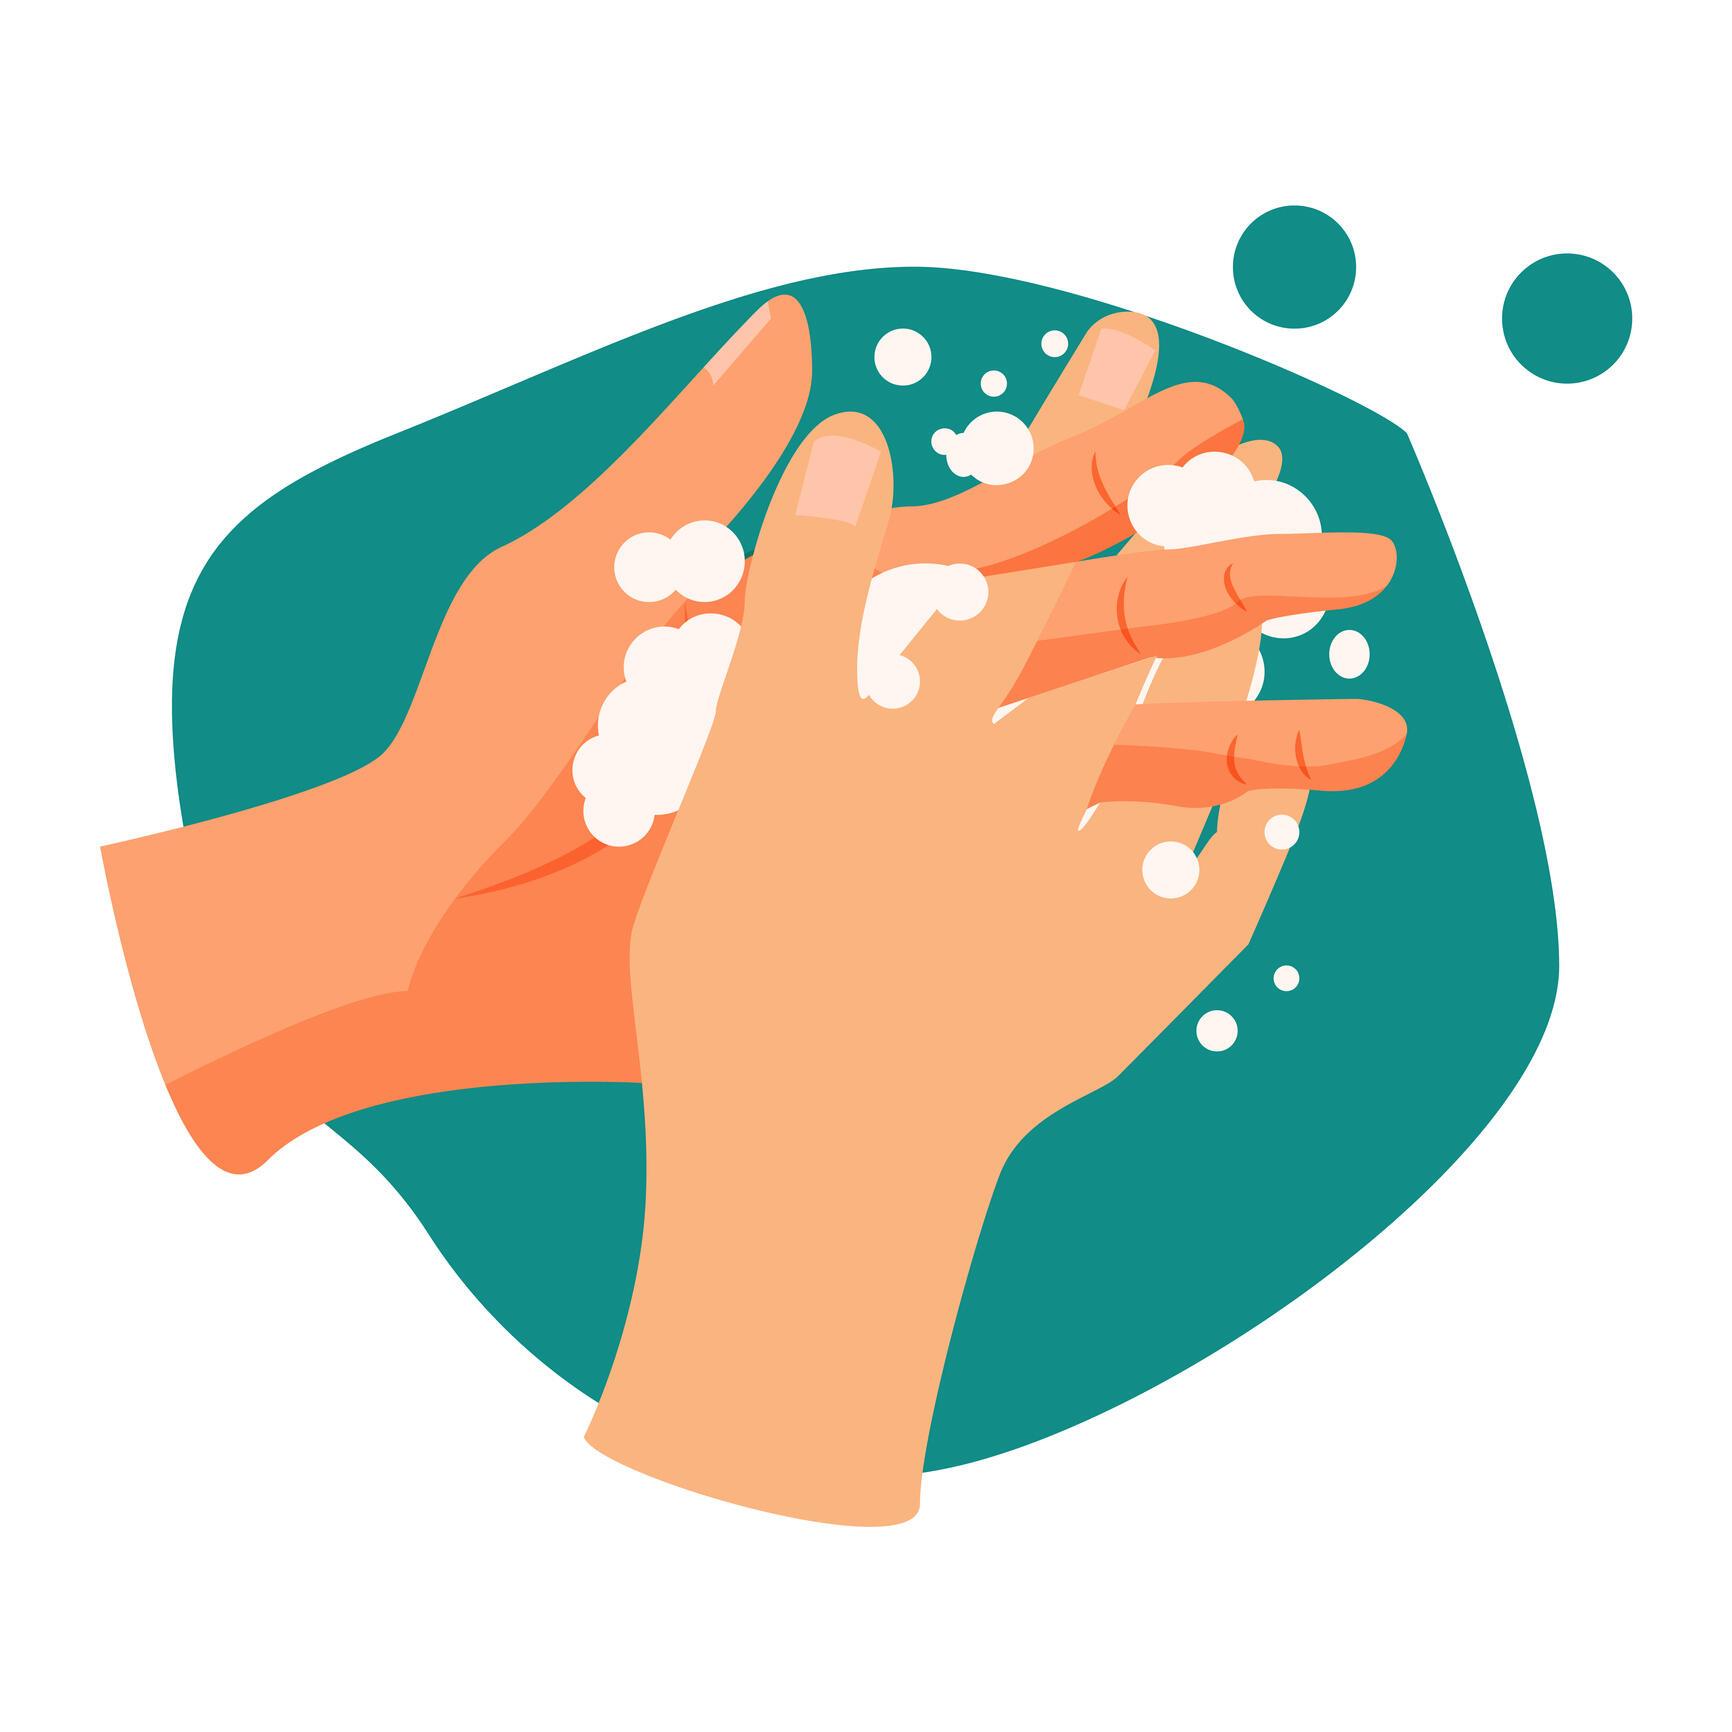 Lifebuoy bar soap hand wash study (RCT) | LSTM